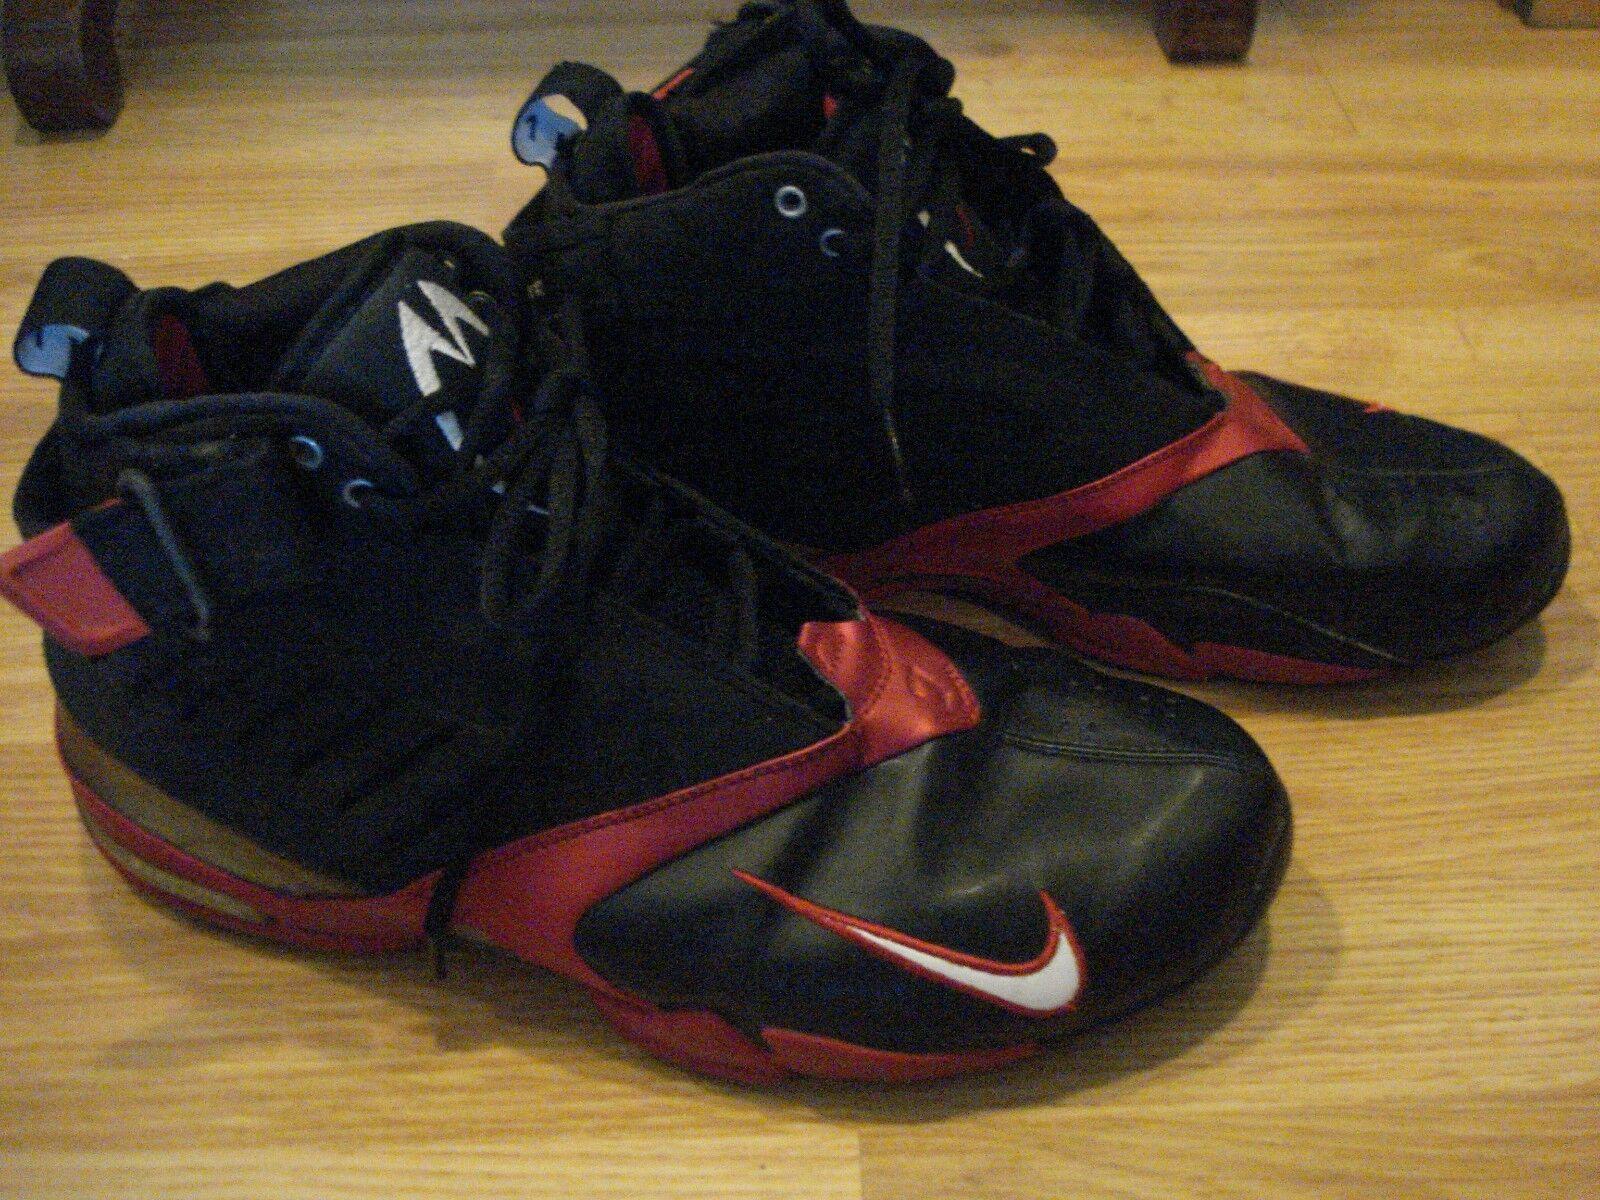 2003 Nike Air Zoom Vick 7 Black/Red  308252-001 Mens Size10.5